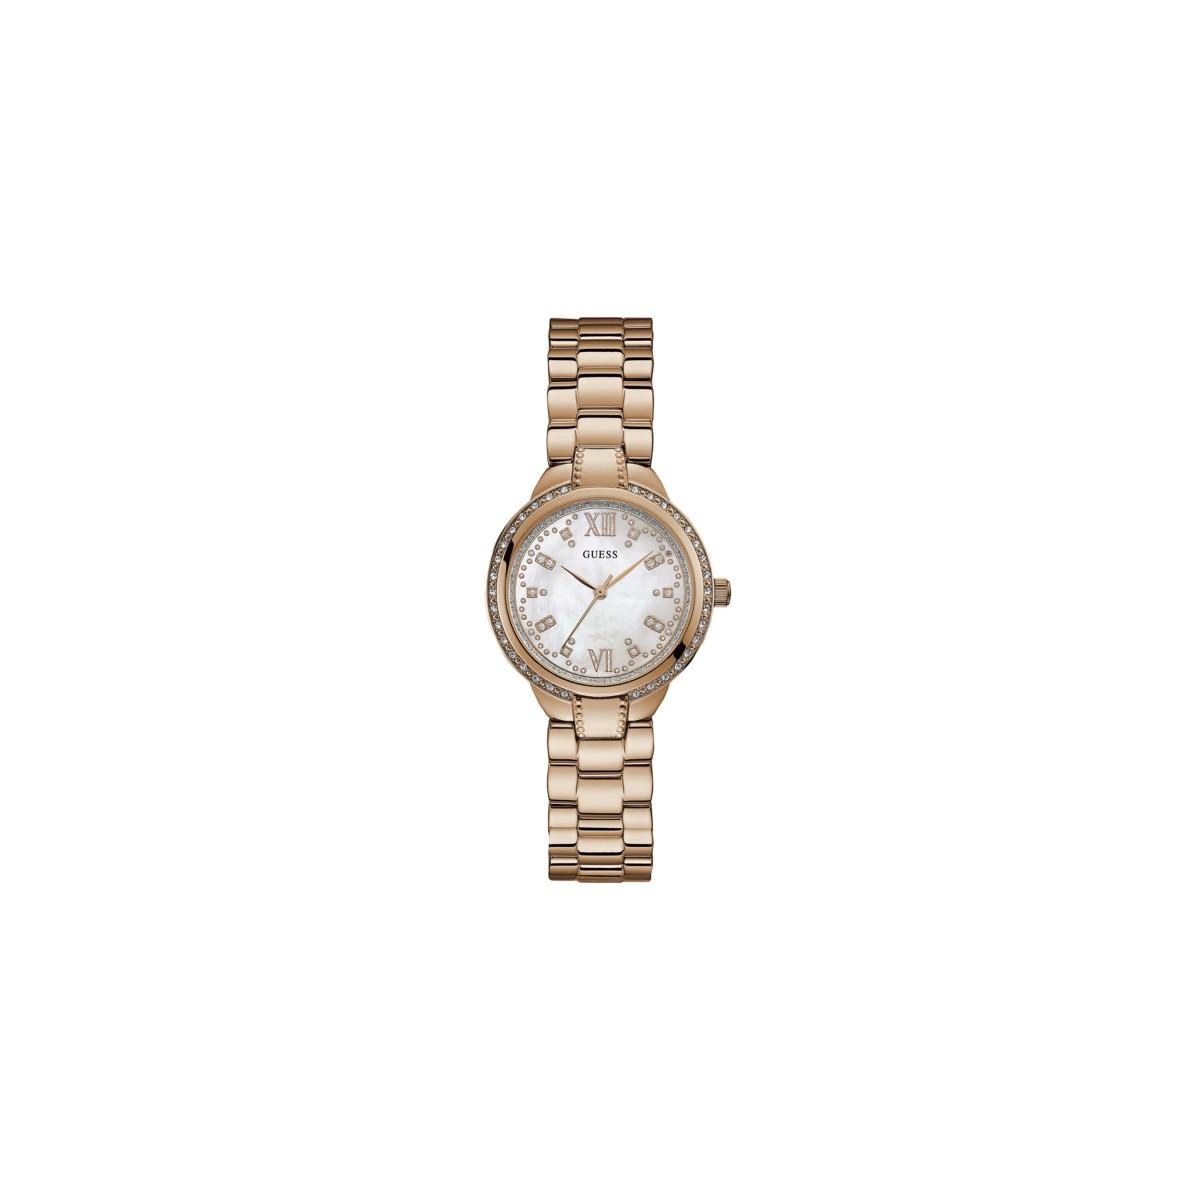 https://www.gaberjoyeria.com/3962-thickbox_default/reloj-guess-w1016l3.jpg